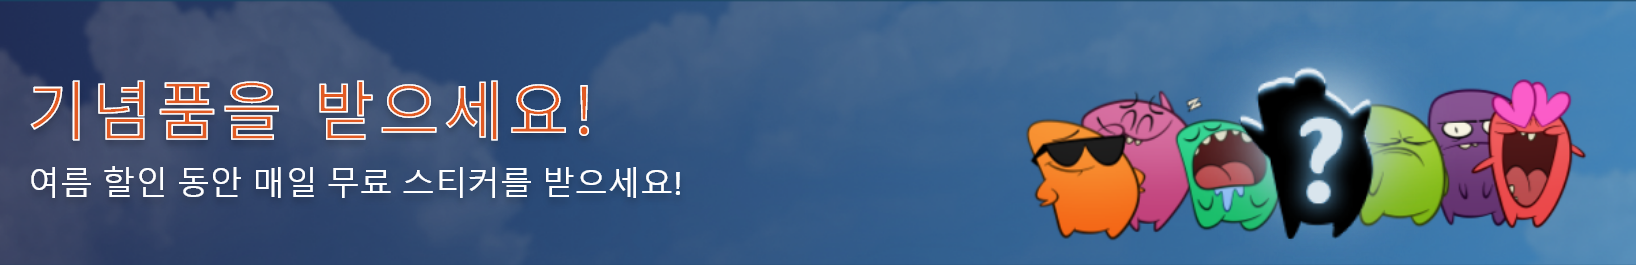 Screenshot_2020-06-26 Steam에 오신 것을 환영합니다.png